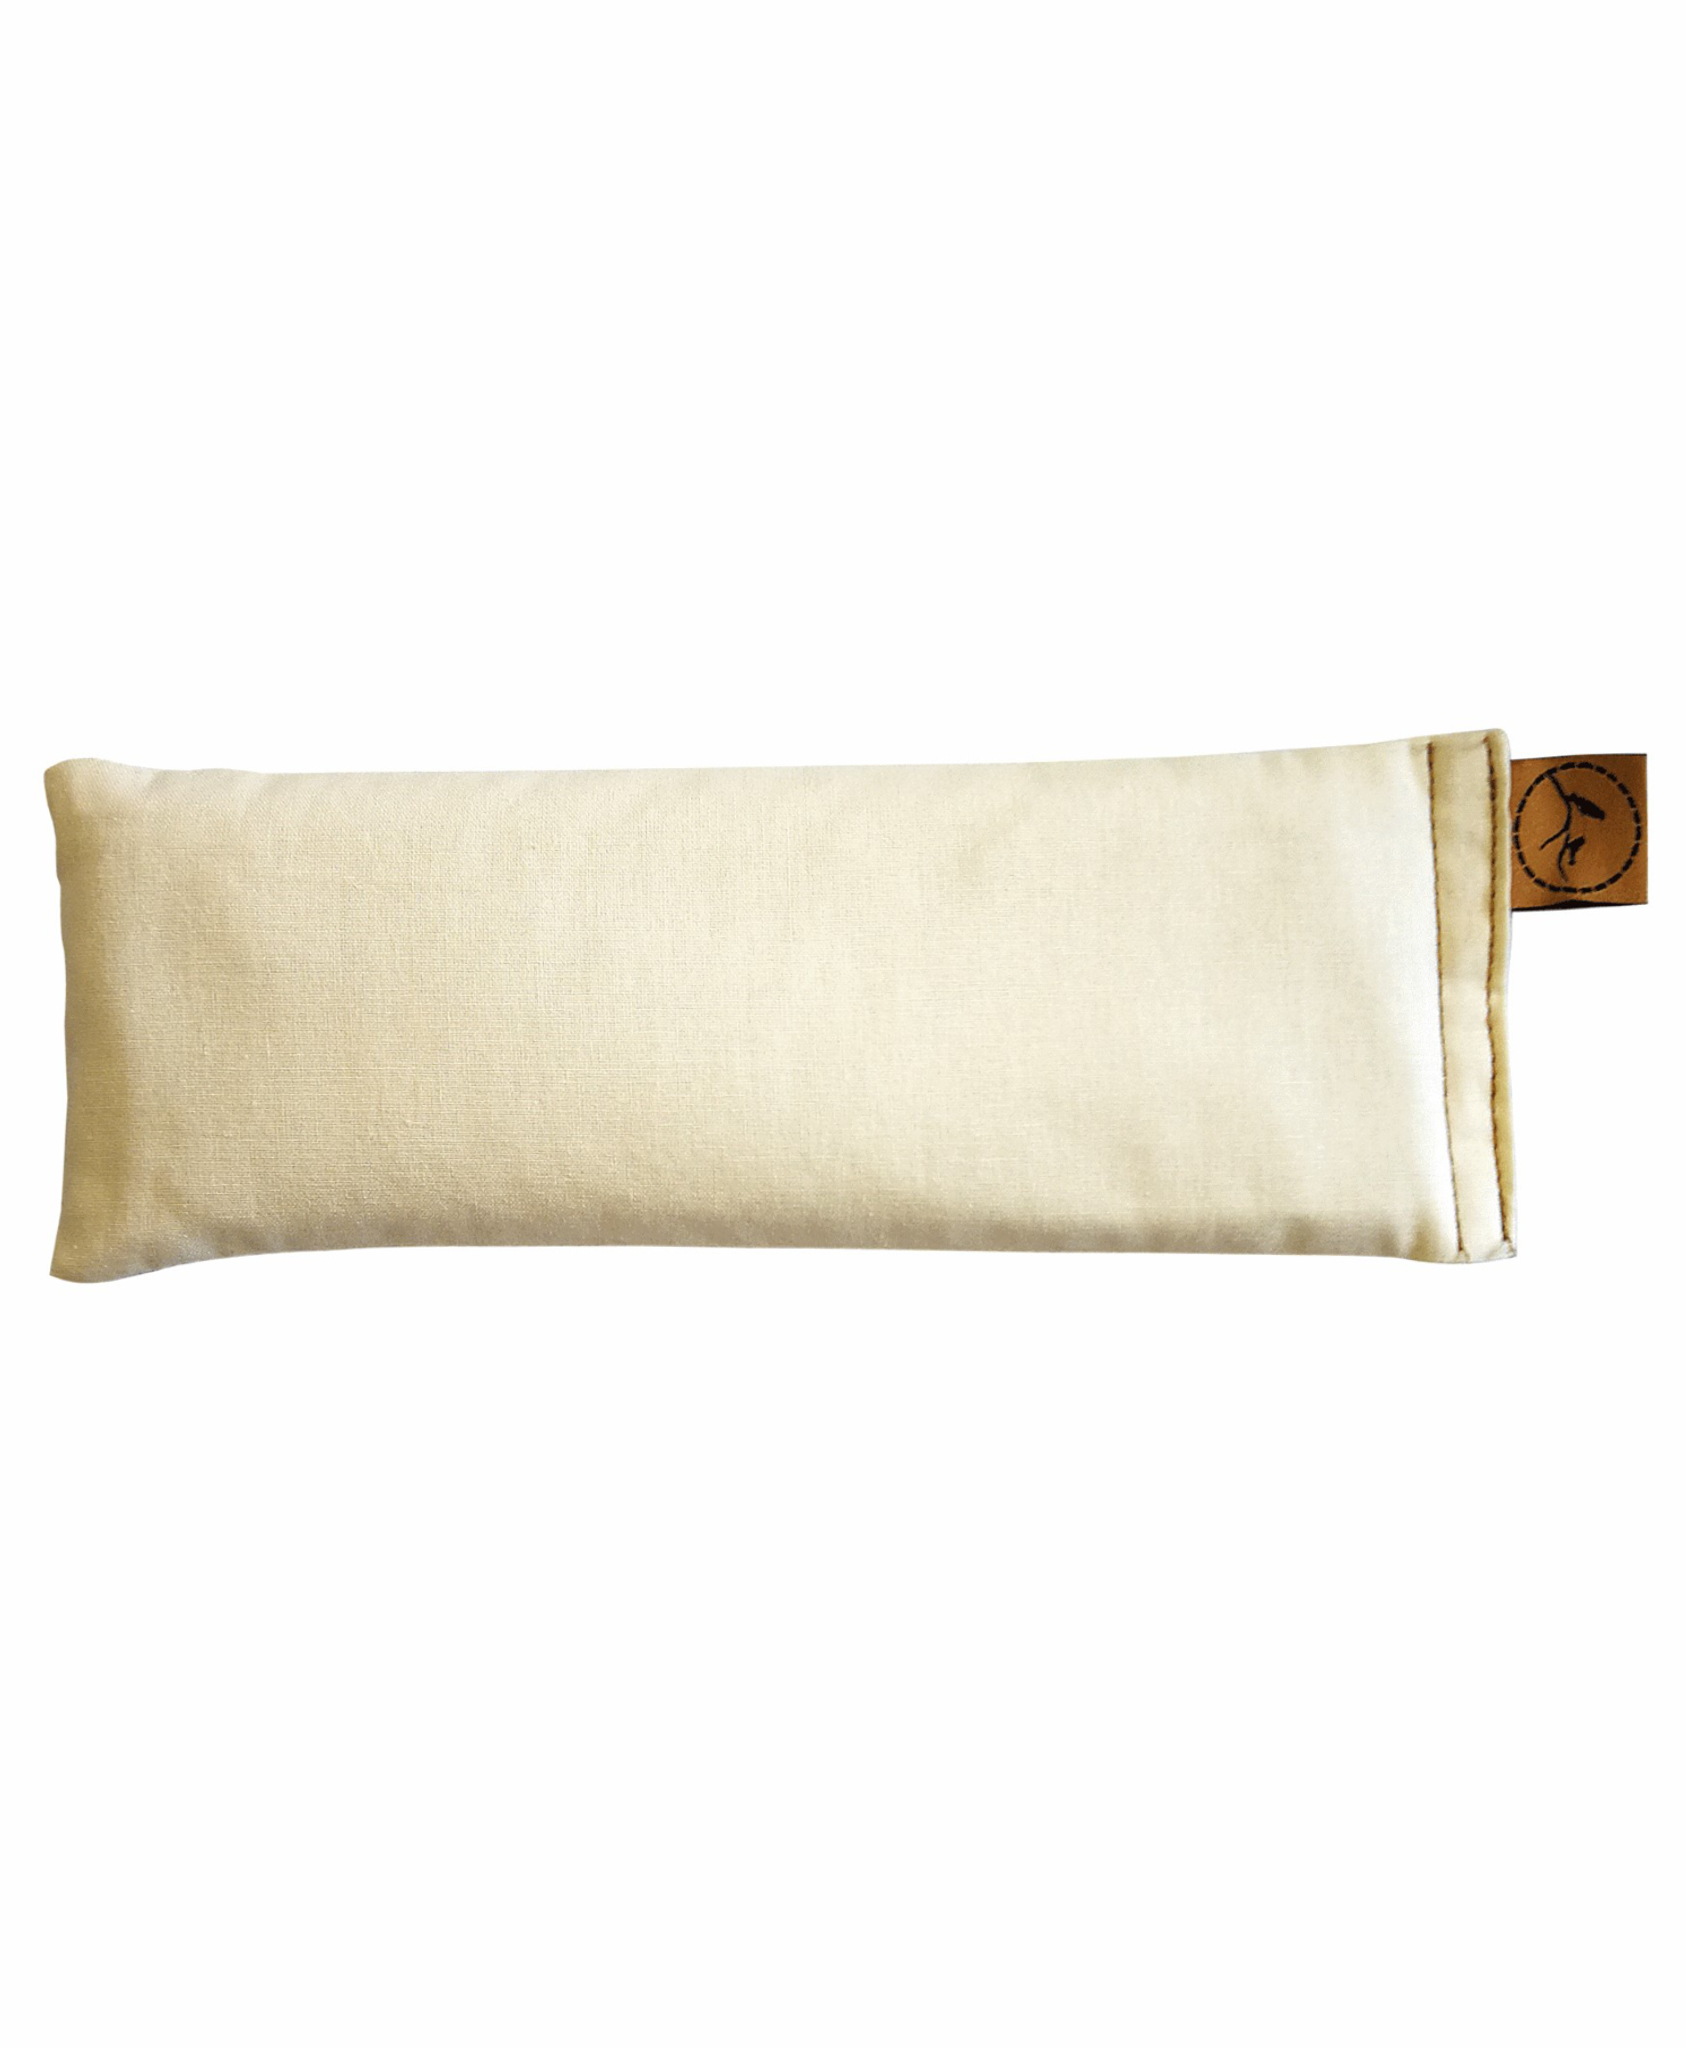 Cream-Classic-eye-pillow-lavender-sore-pain-relief-yoga